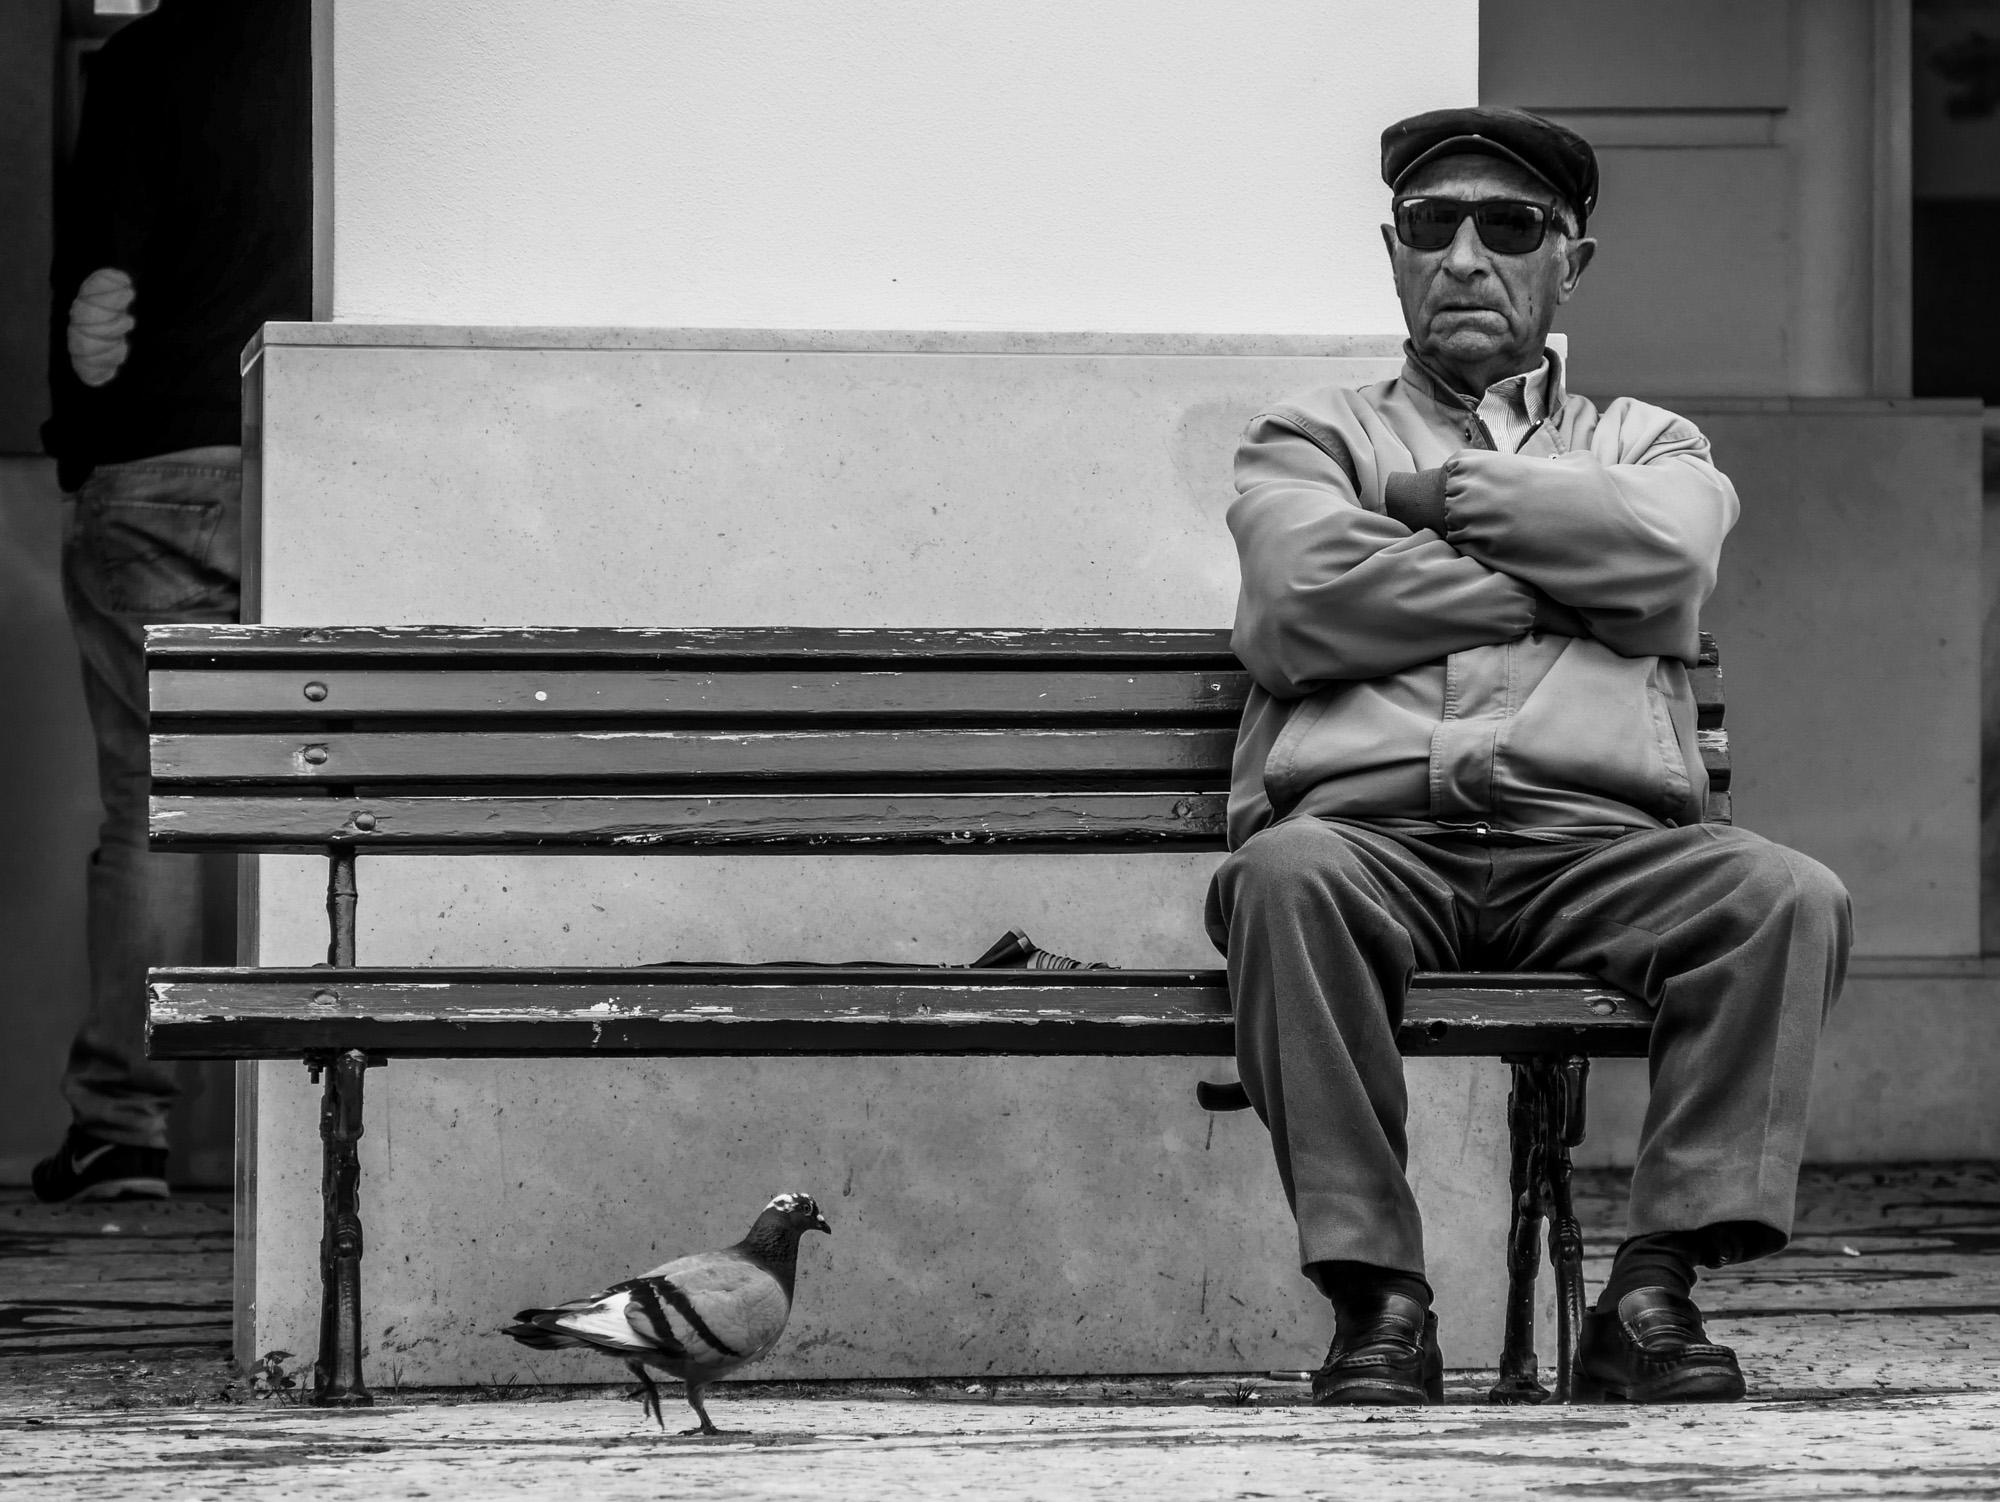 Man on the bench   Aveiro Portugal